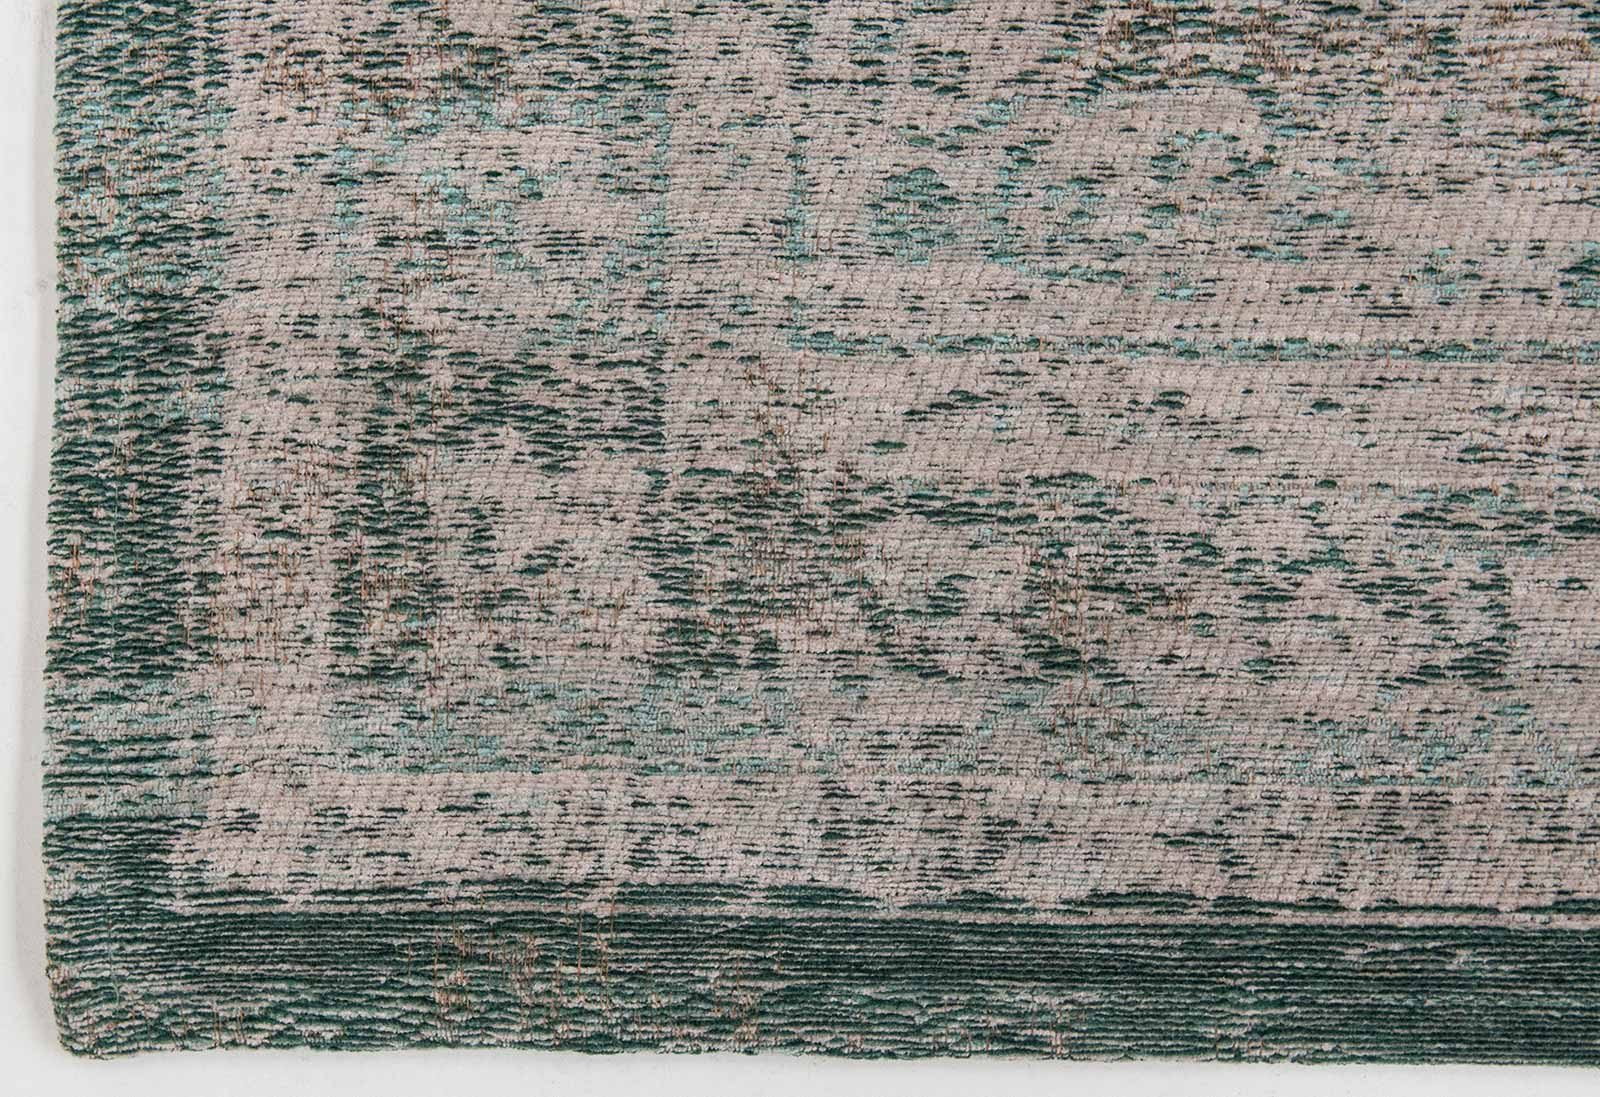 vloerkleed Louis De Poortere LX8259 Fading World Medaillon Jade Oyster corner